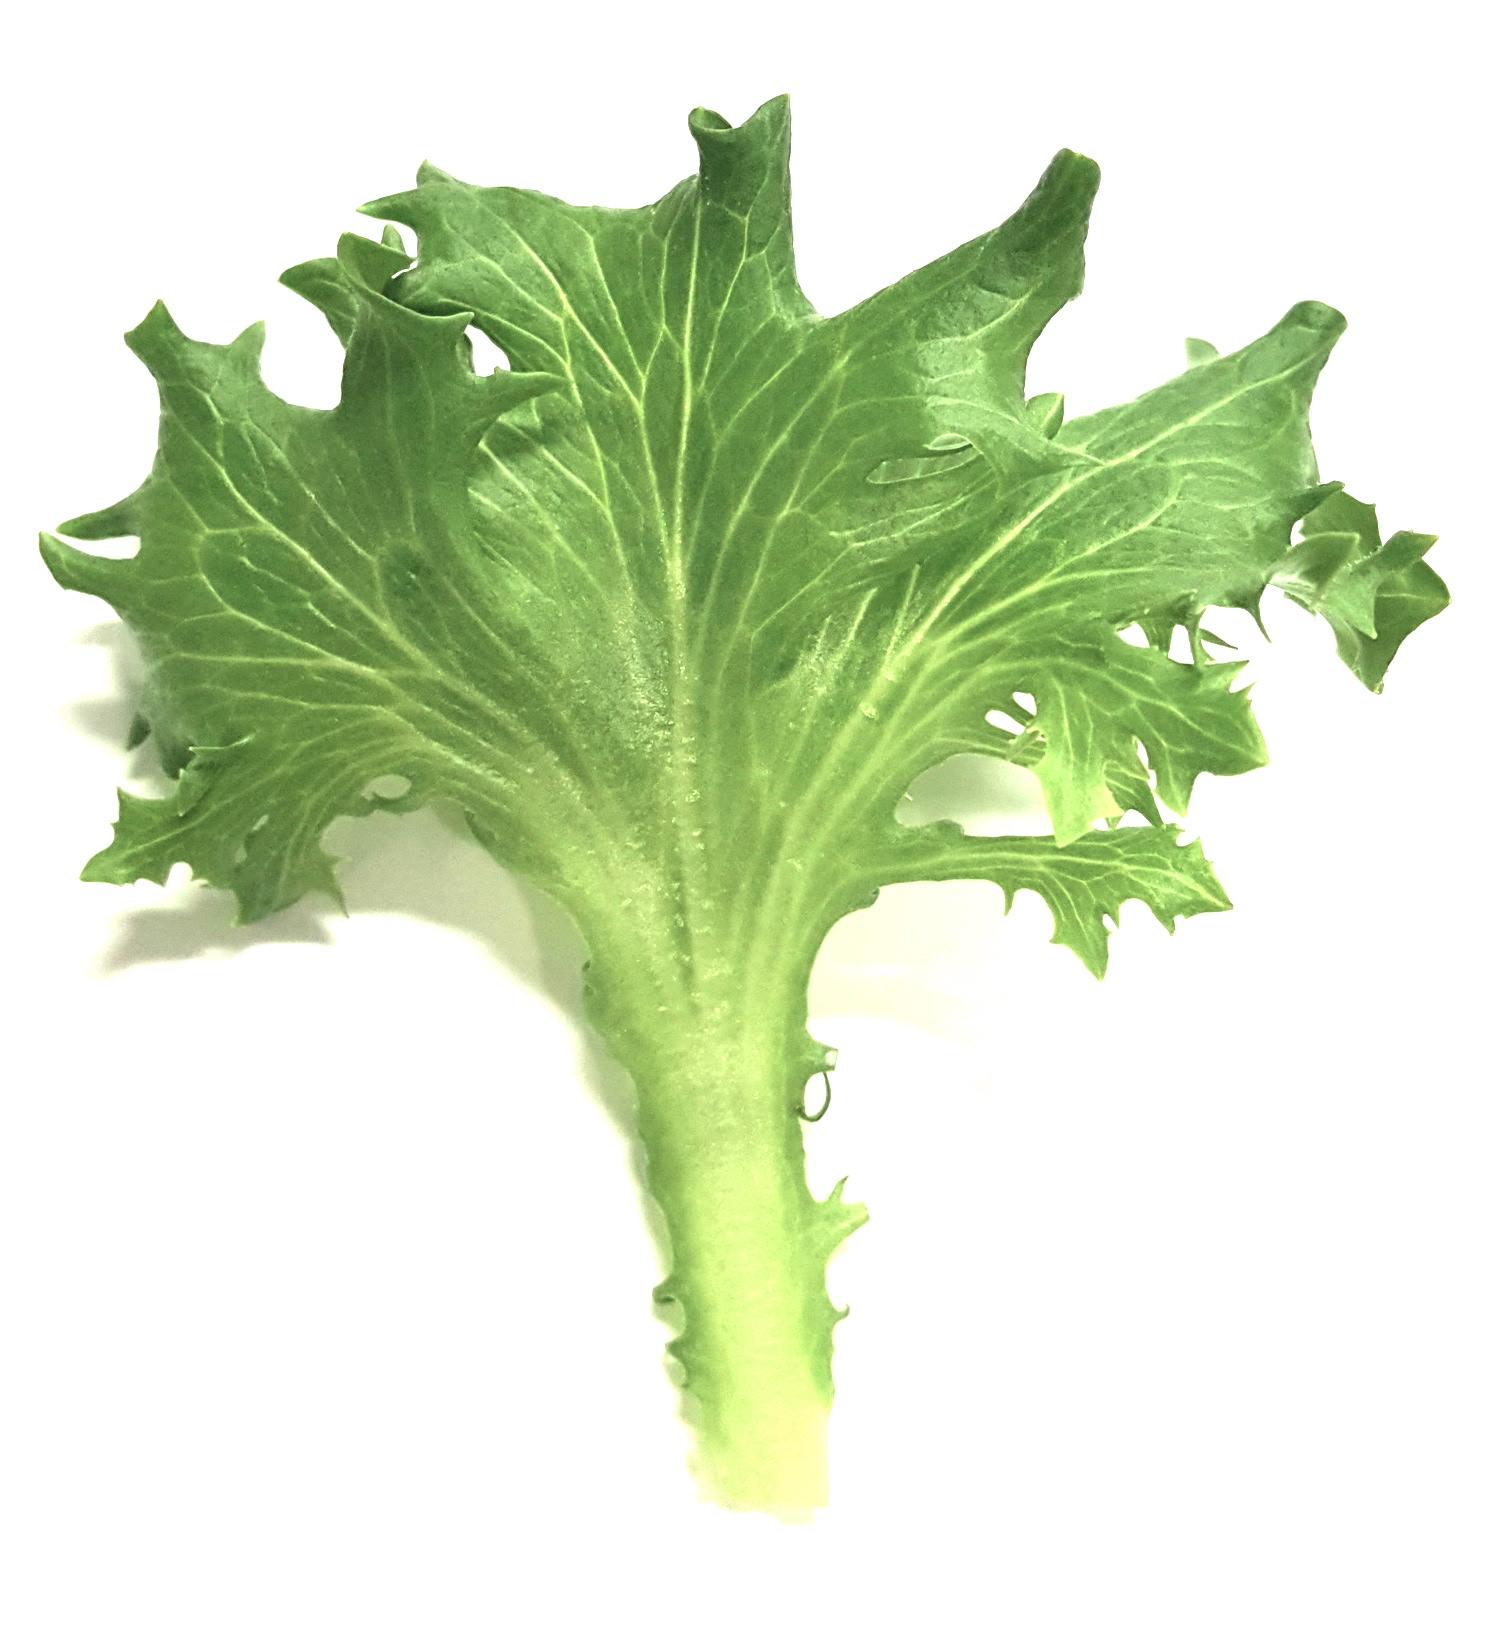 Green Sweet Crisp lettuce - Crisp & CrunchyFor salads, sandwiches, wraps